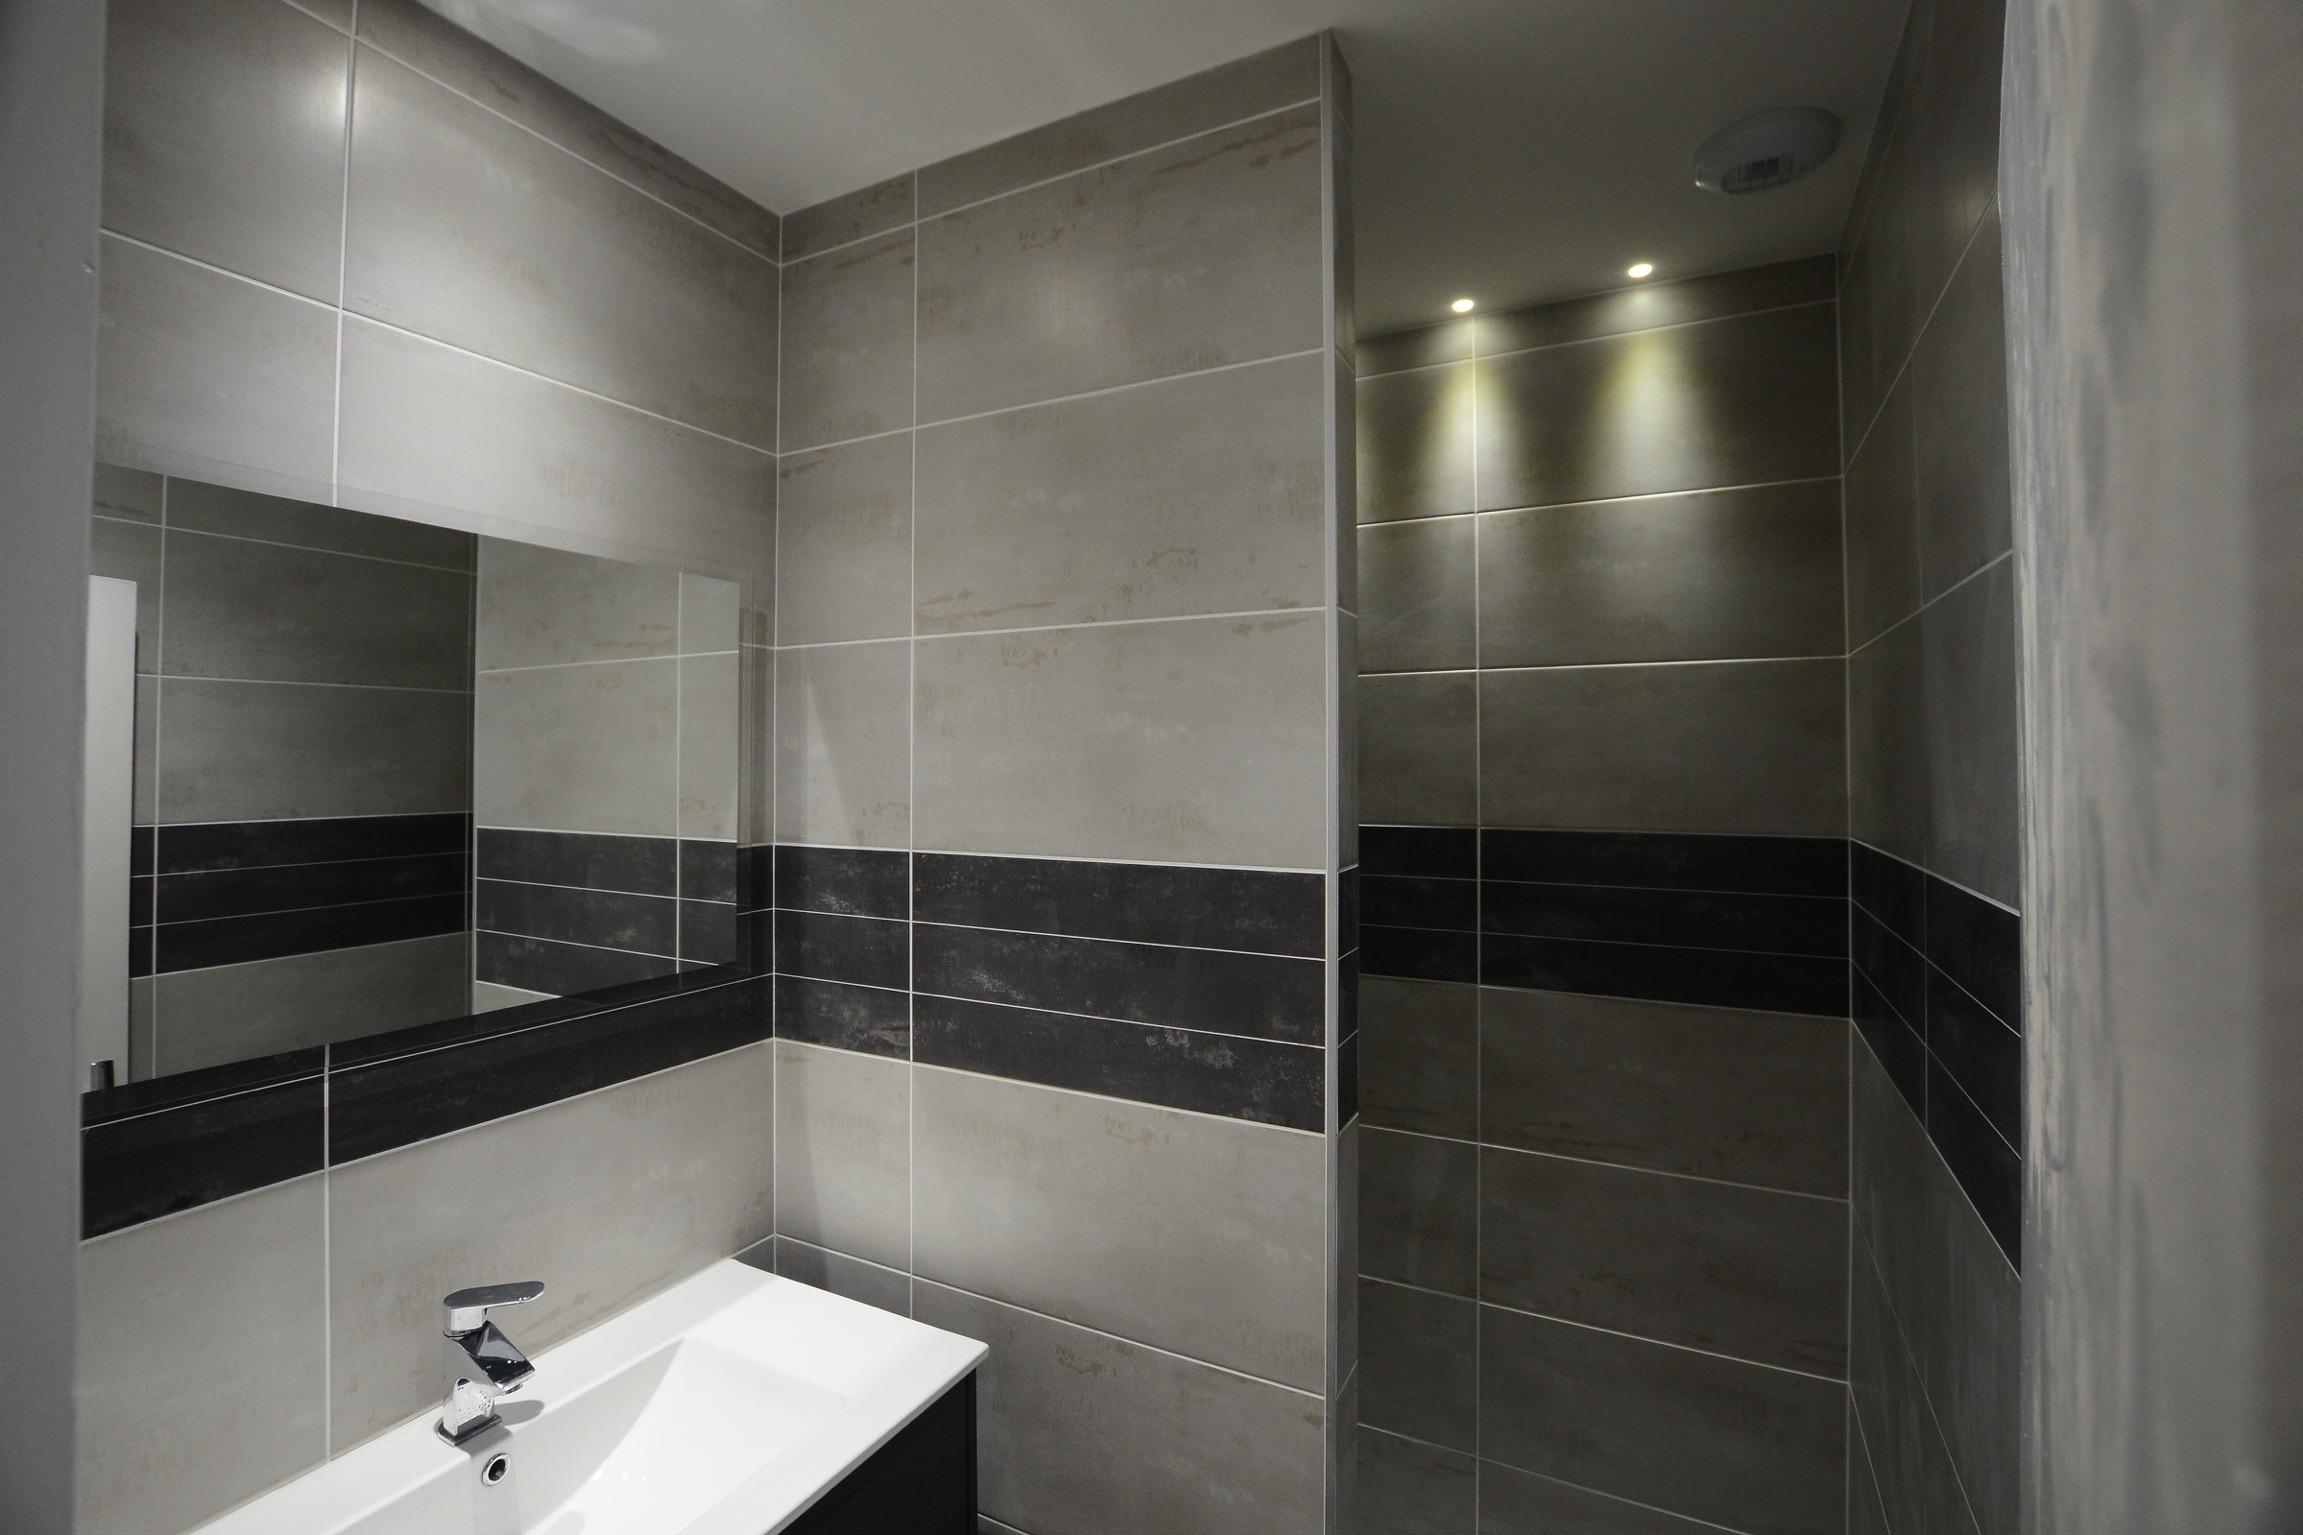 plombier toulouse r novation et plomberie in renov. Black Bedroom Furniture Sets. Home Design Ideas